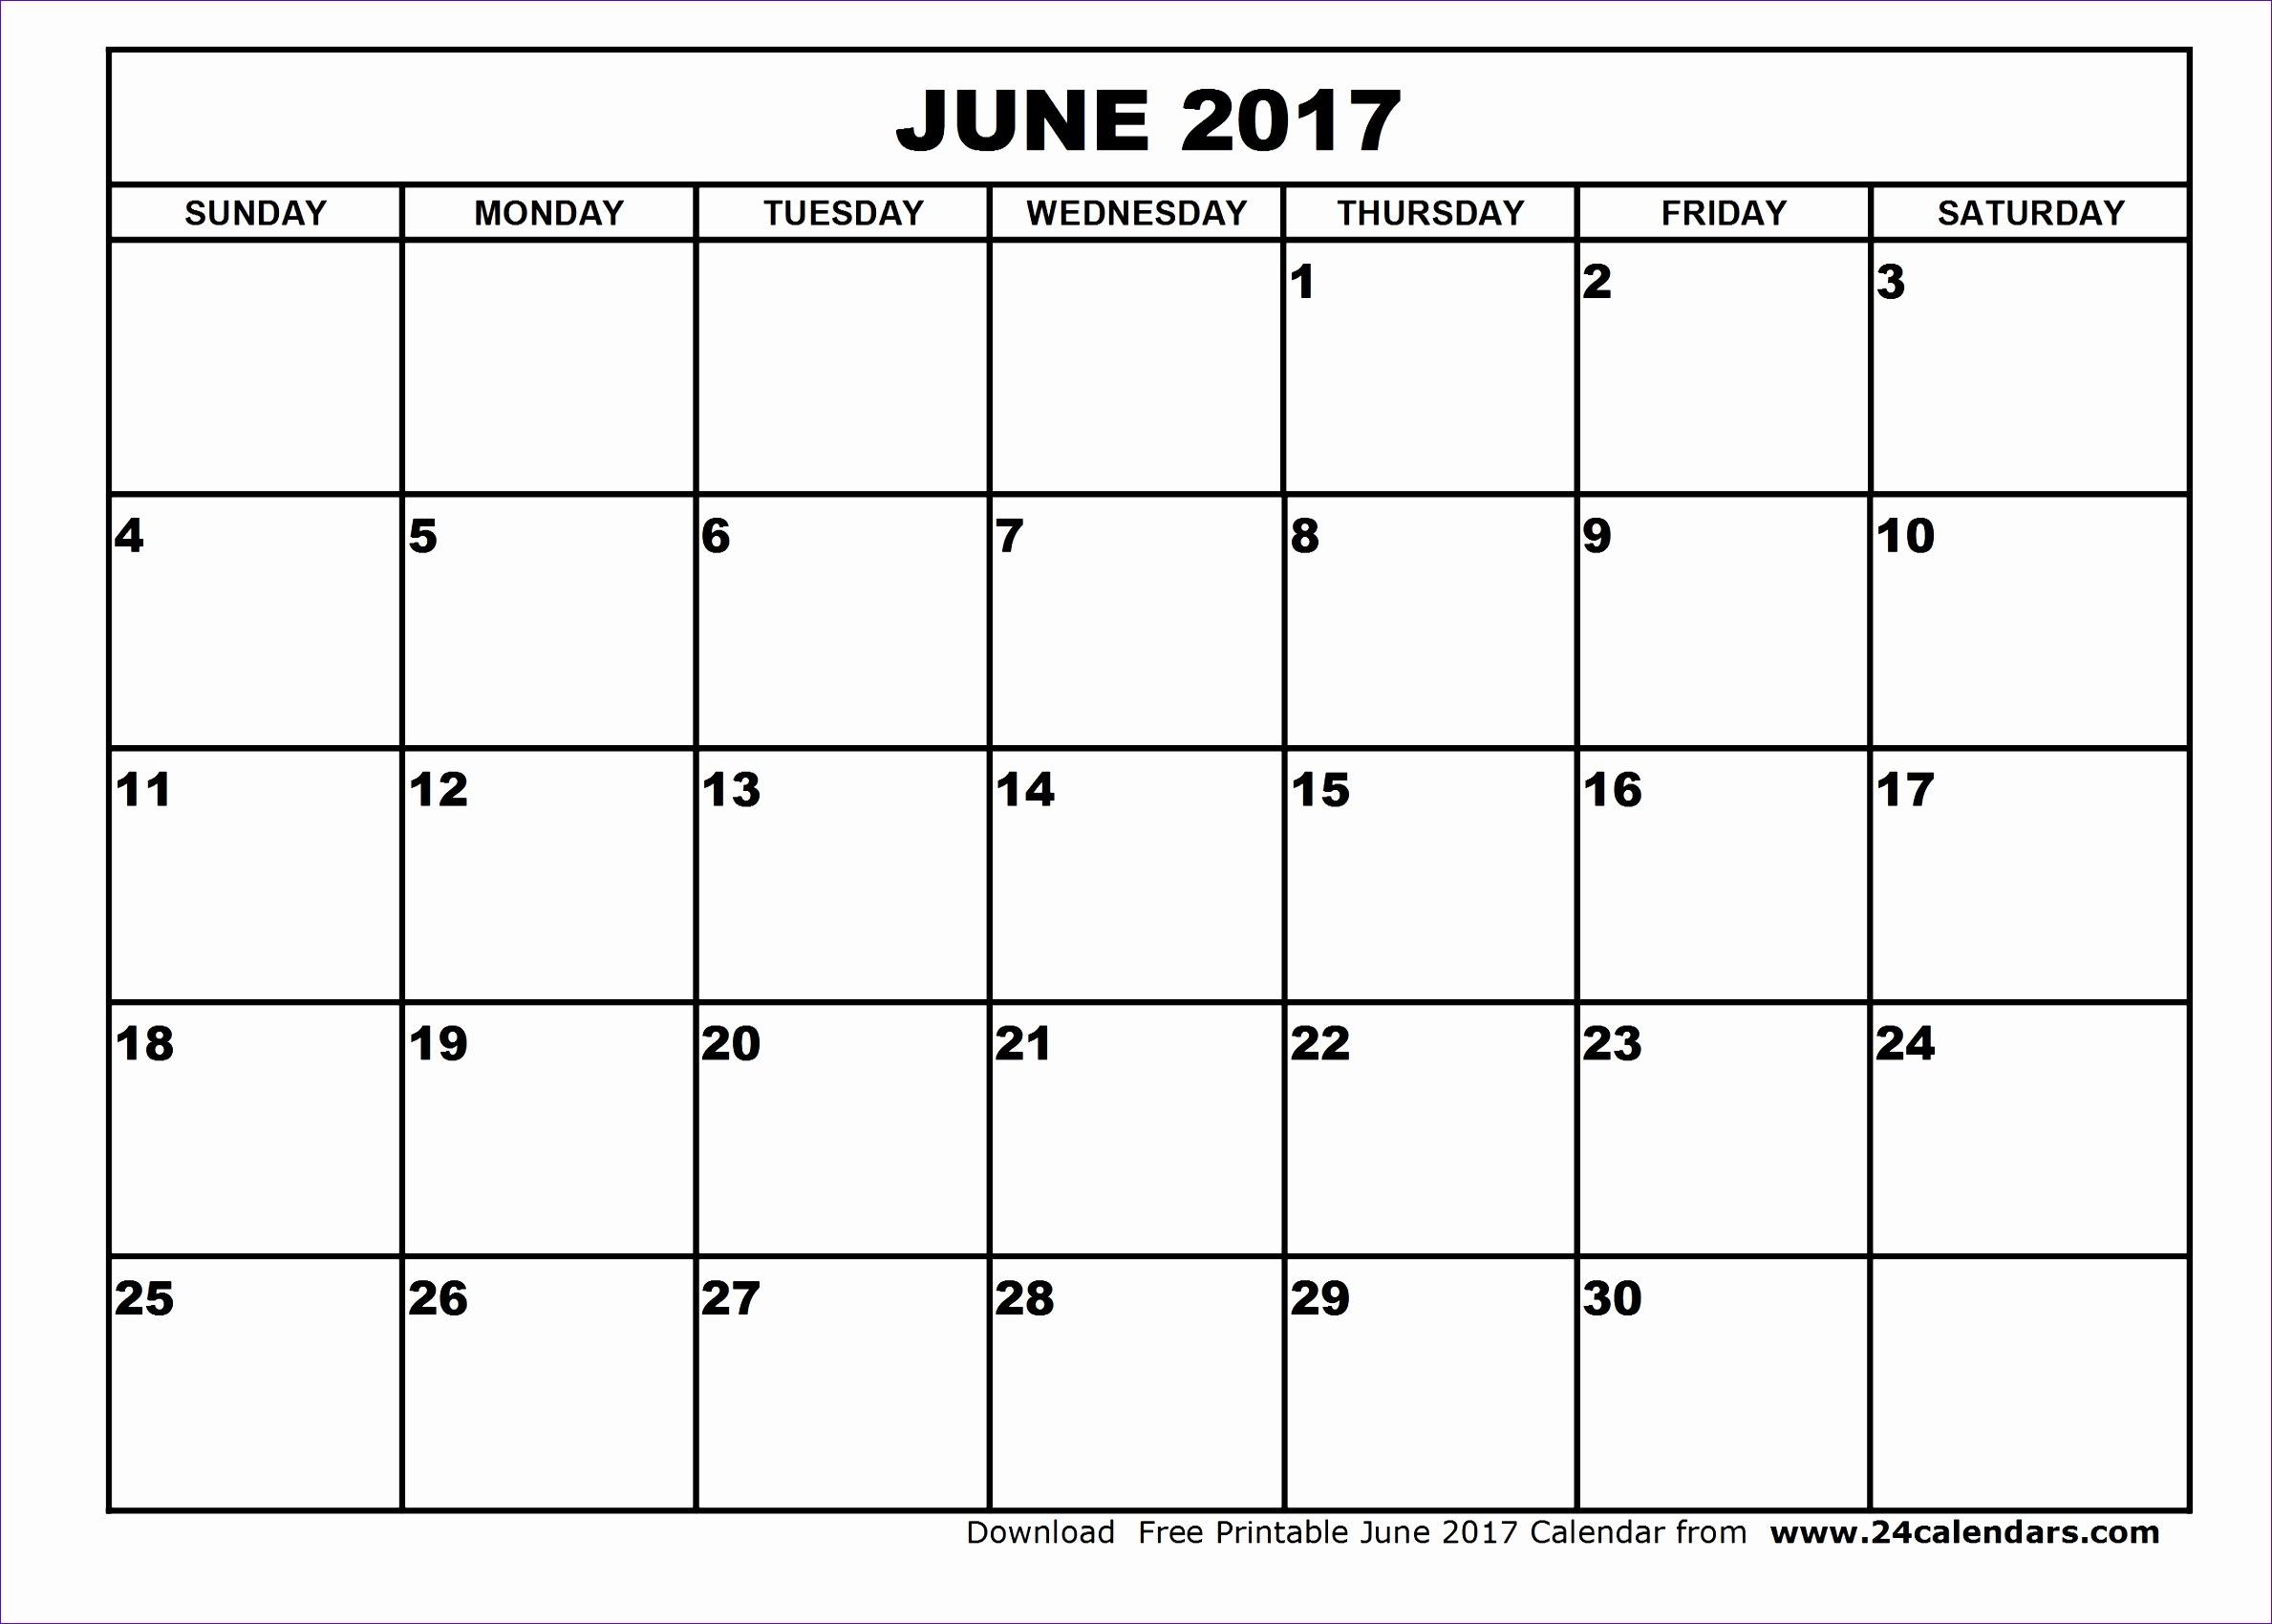 june 2017 calendar template 294